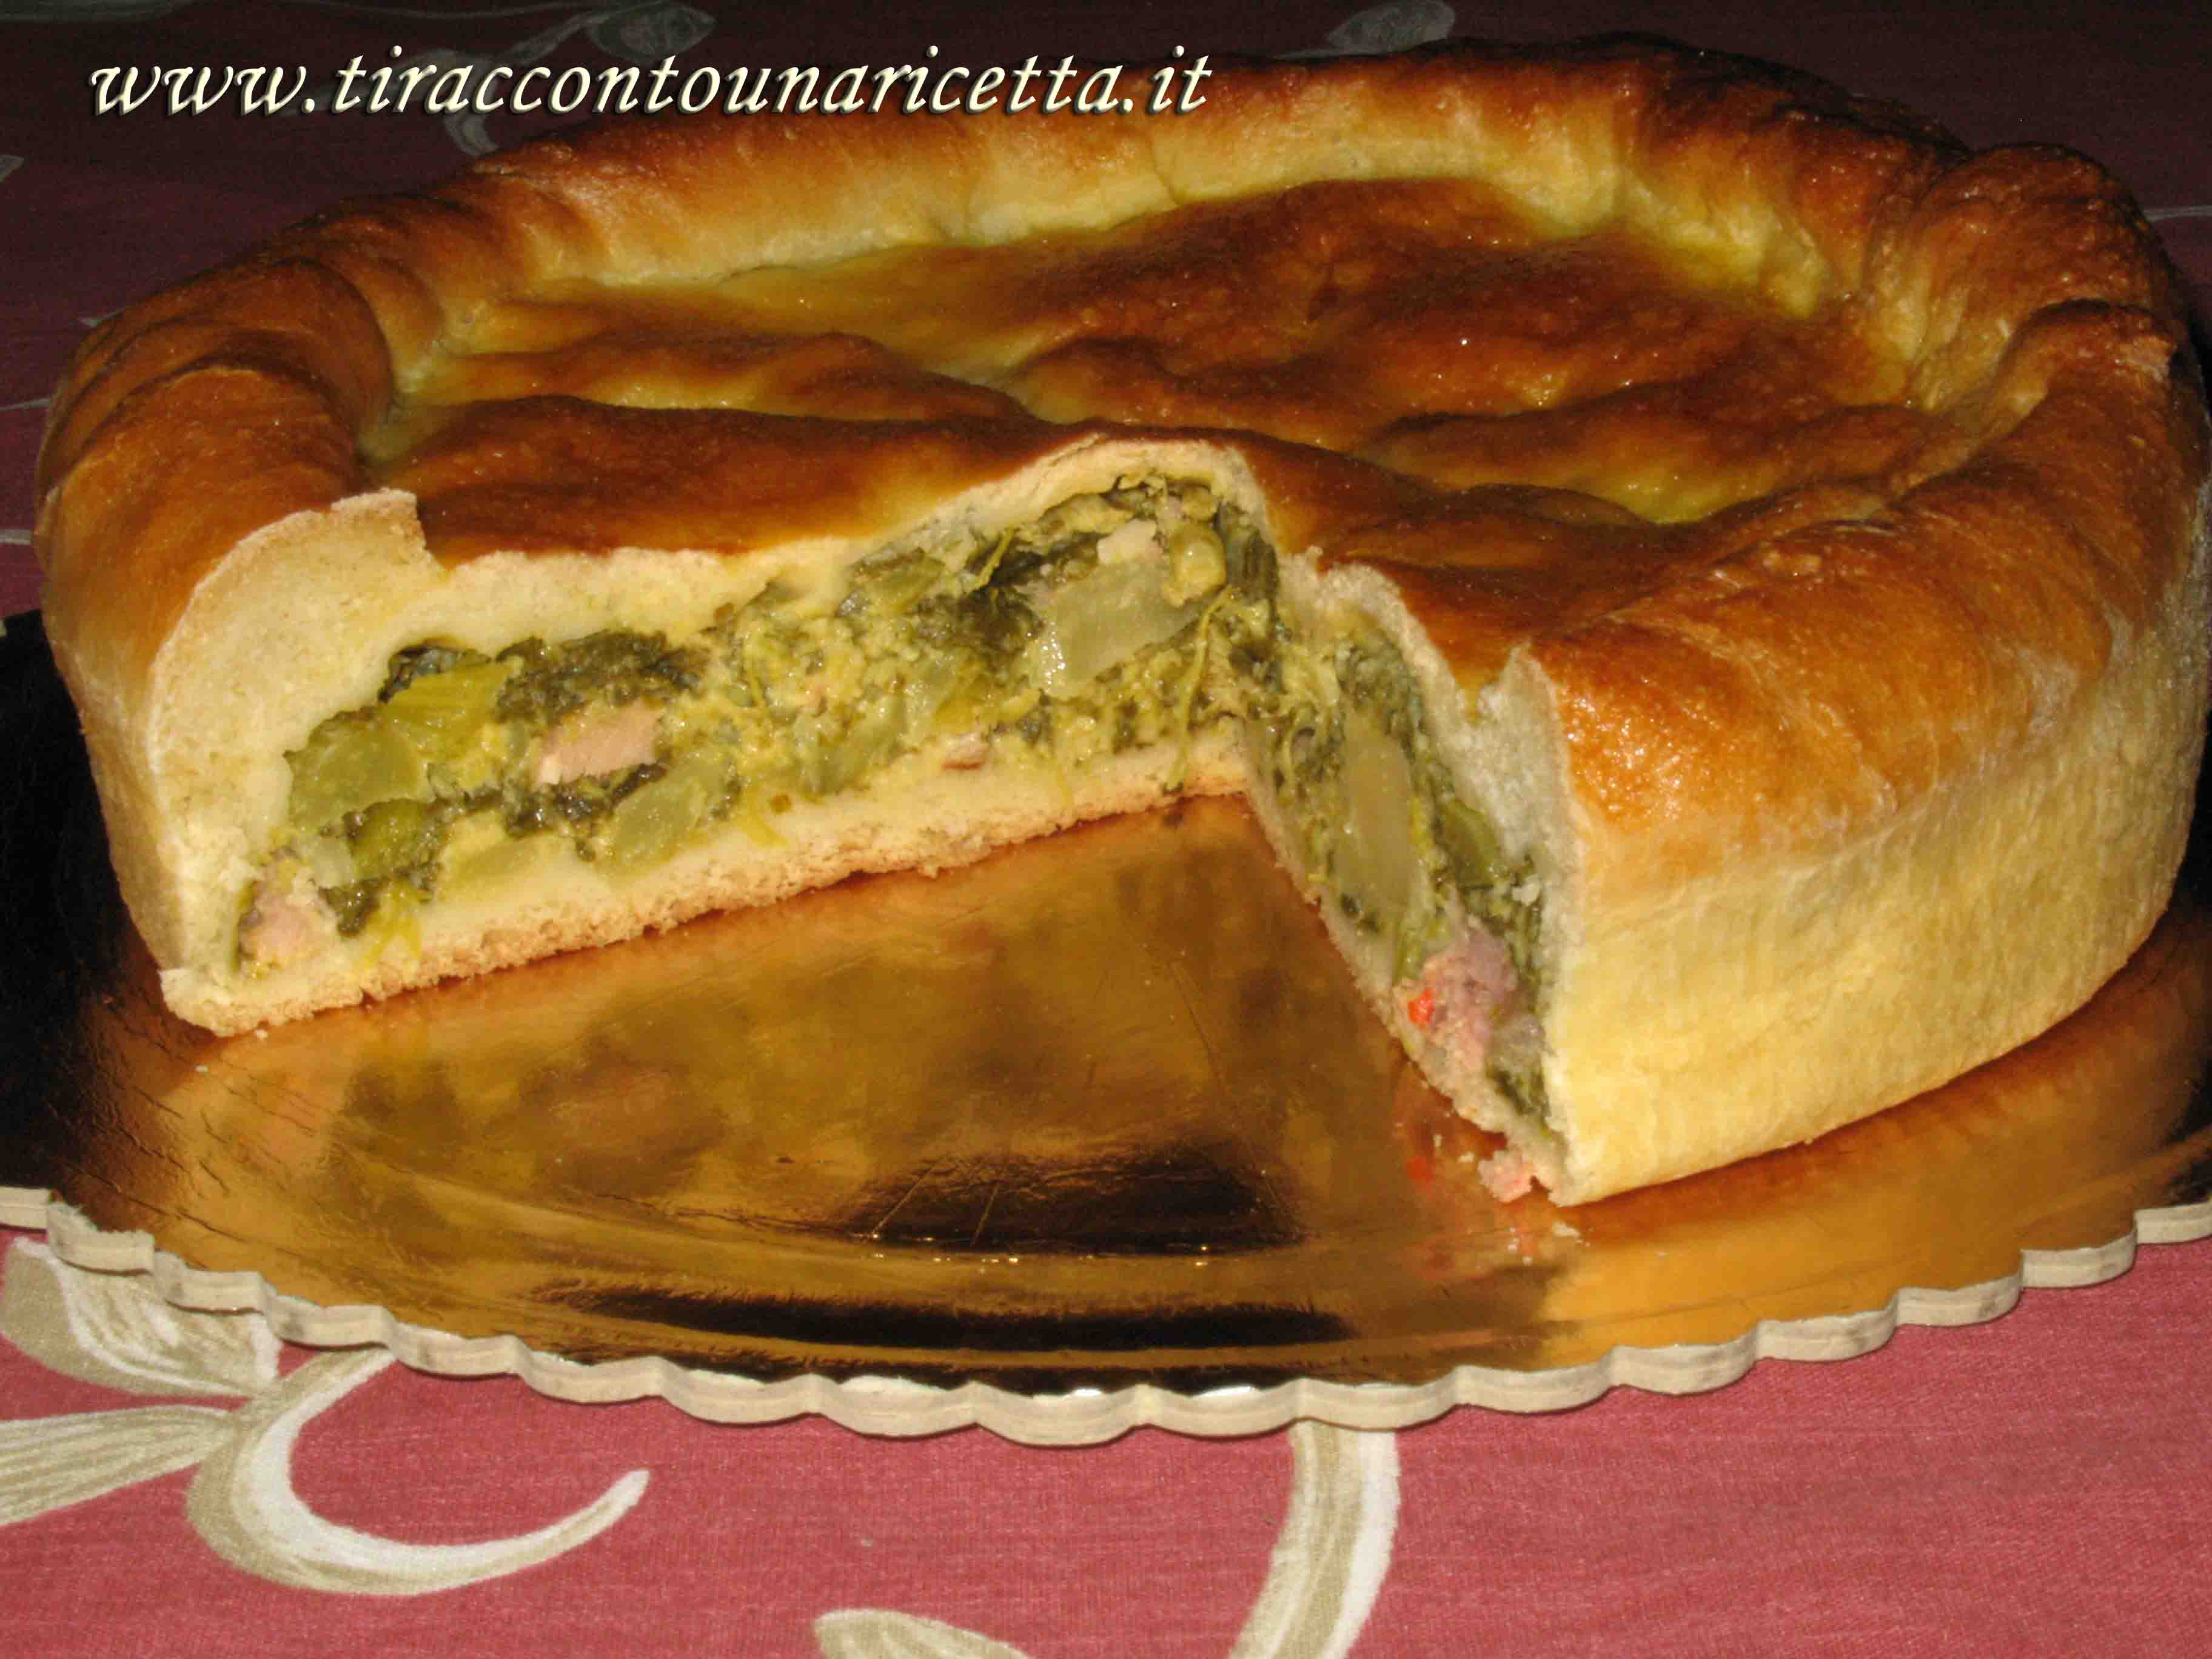 Ricette torta rustica broccoli e salsiccia